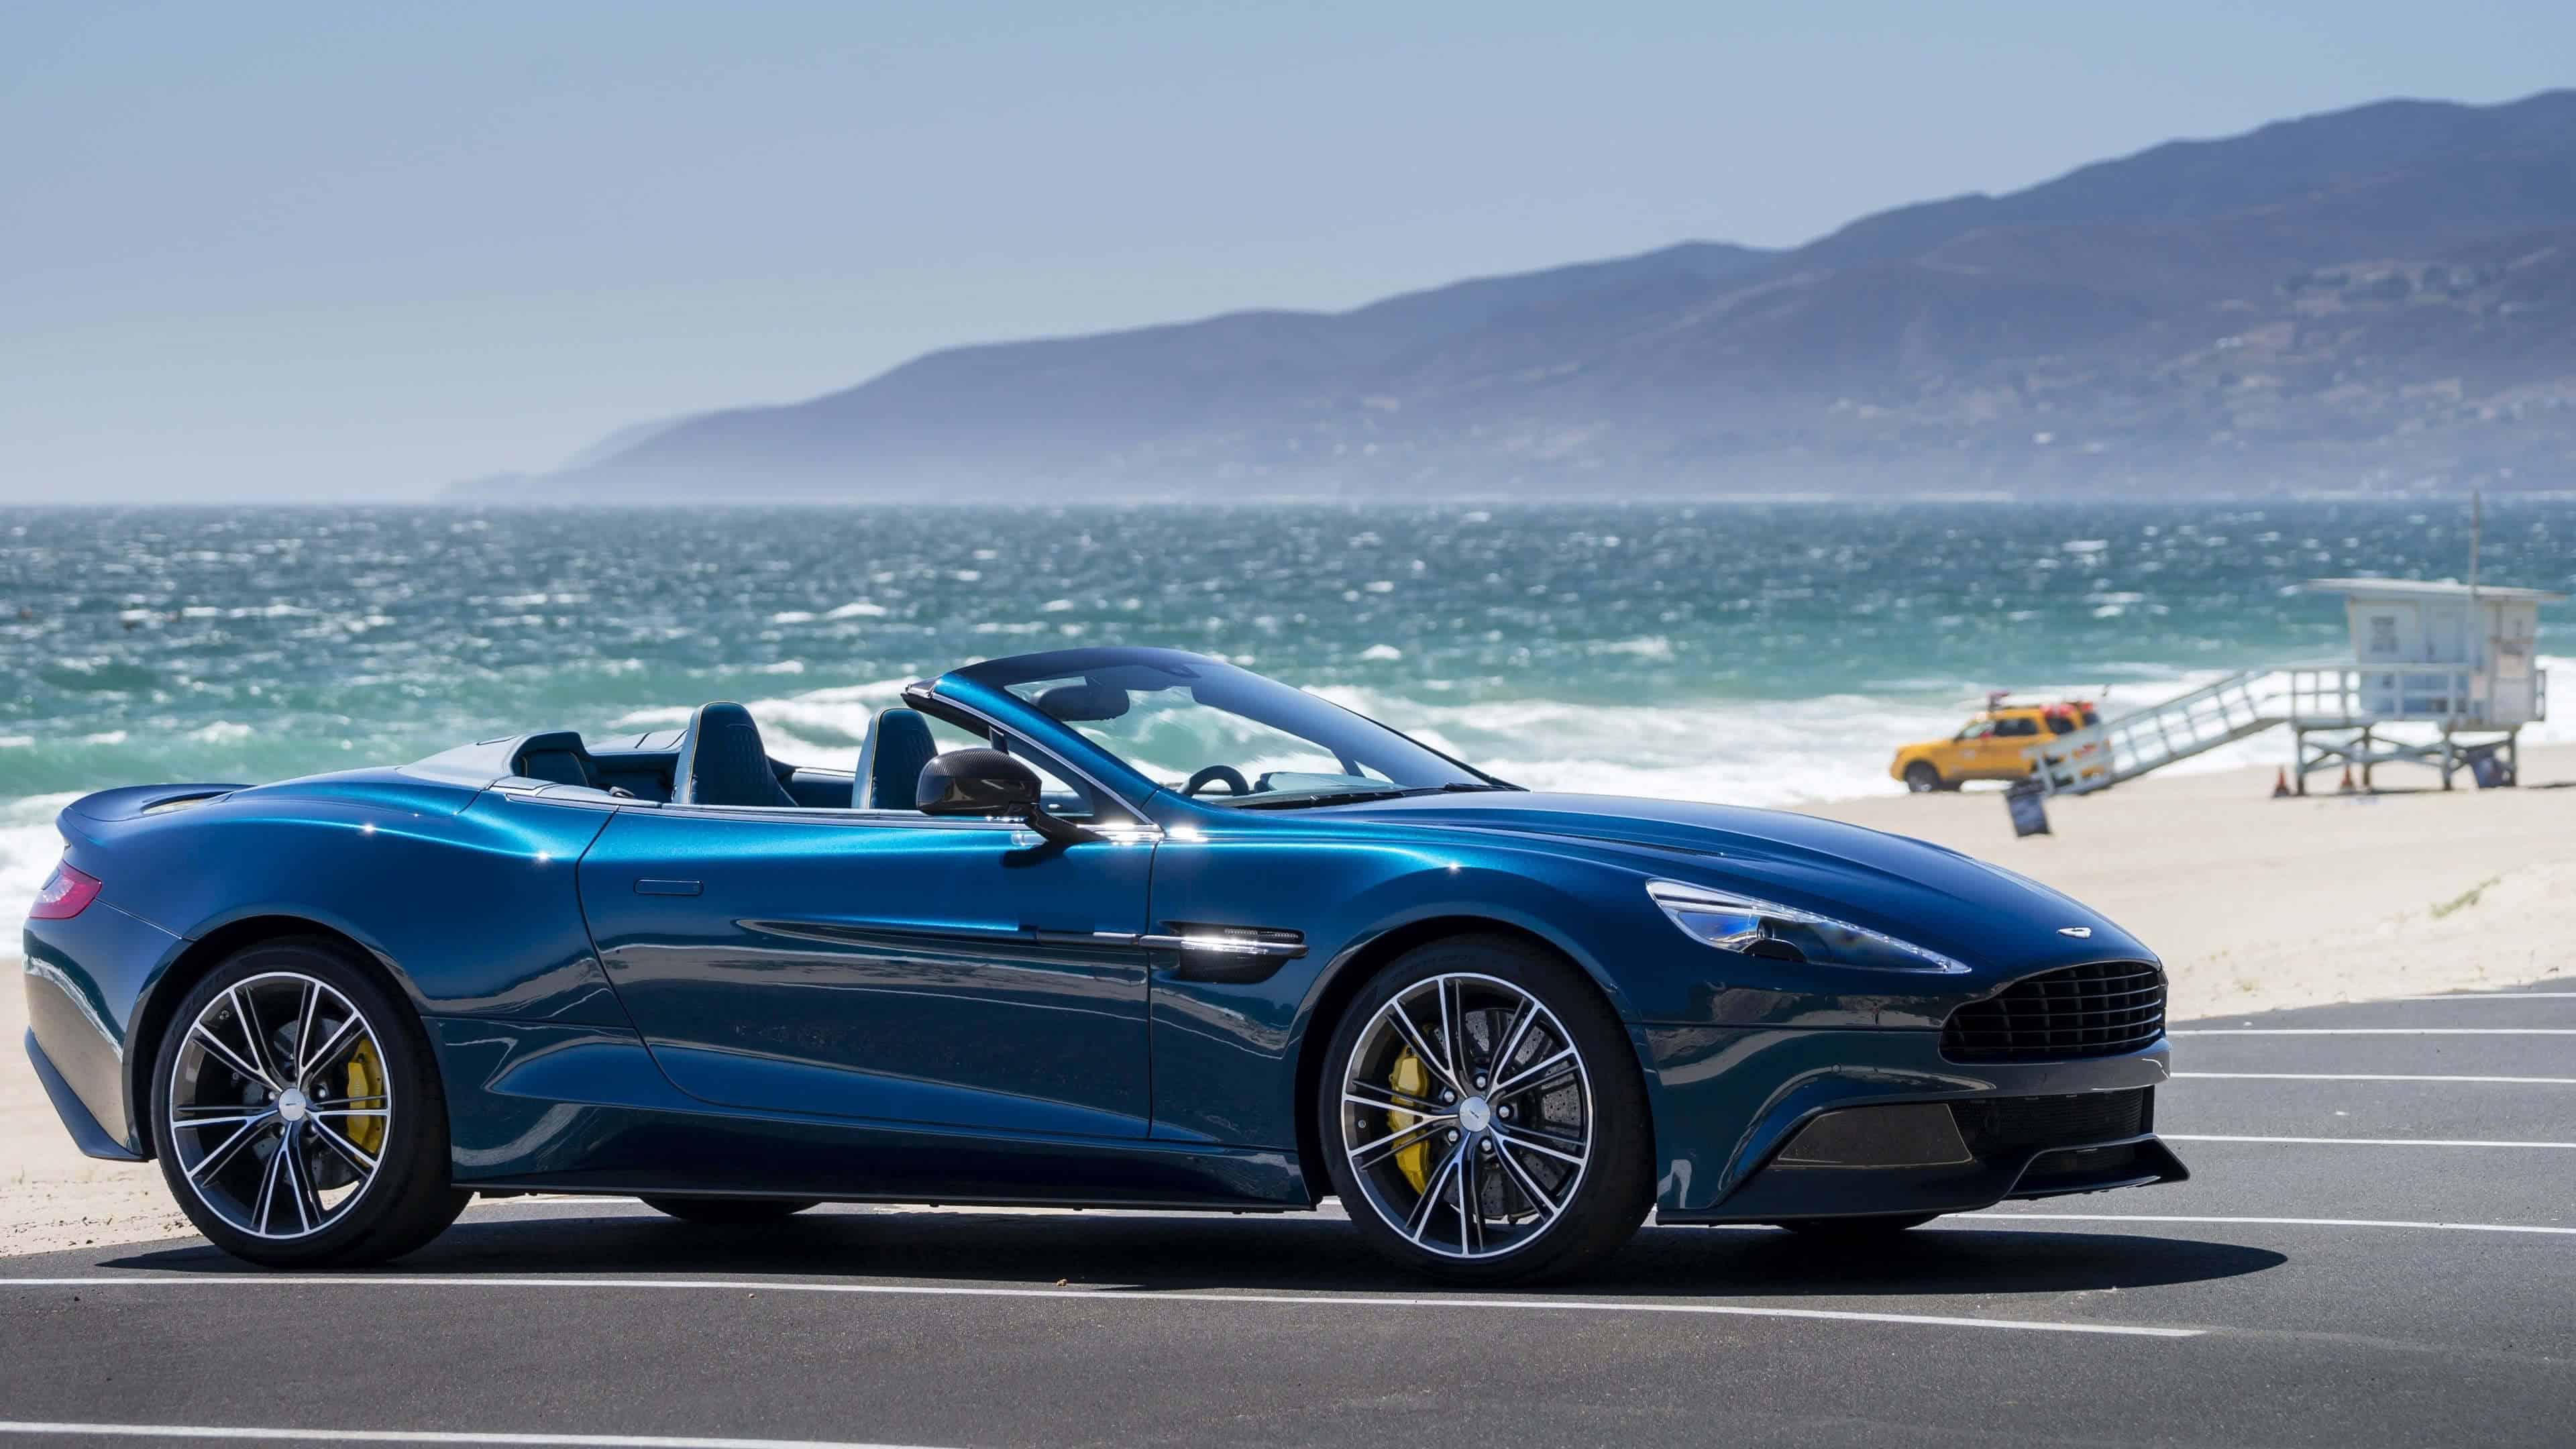 Blue Aston Martin Vanquish Volante Convertible Uhd 4k Wallpaper Pixelz Cc